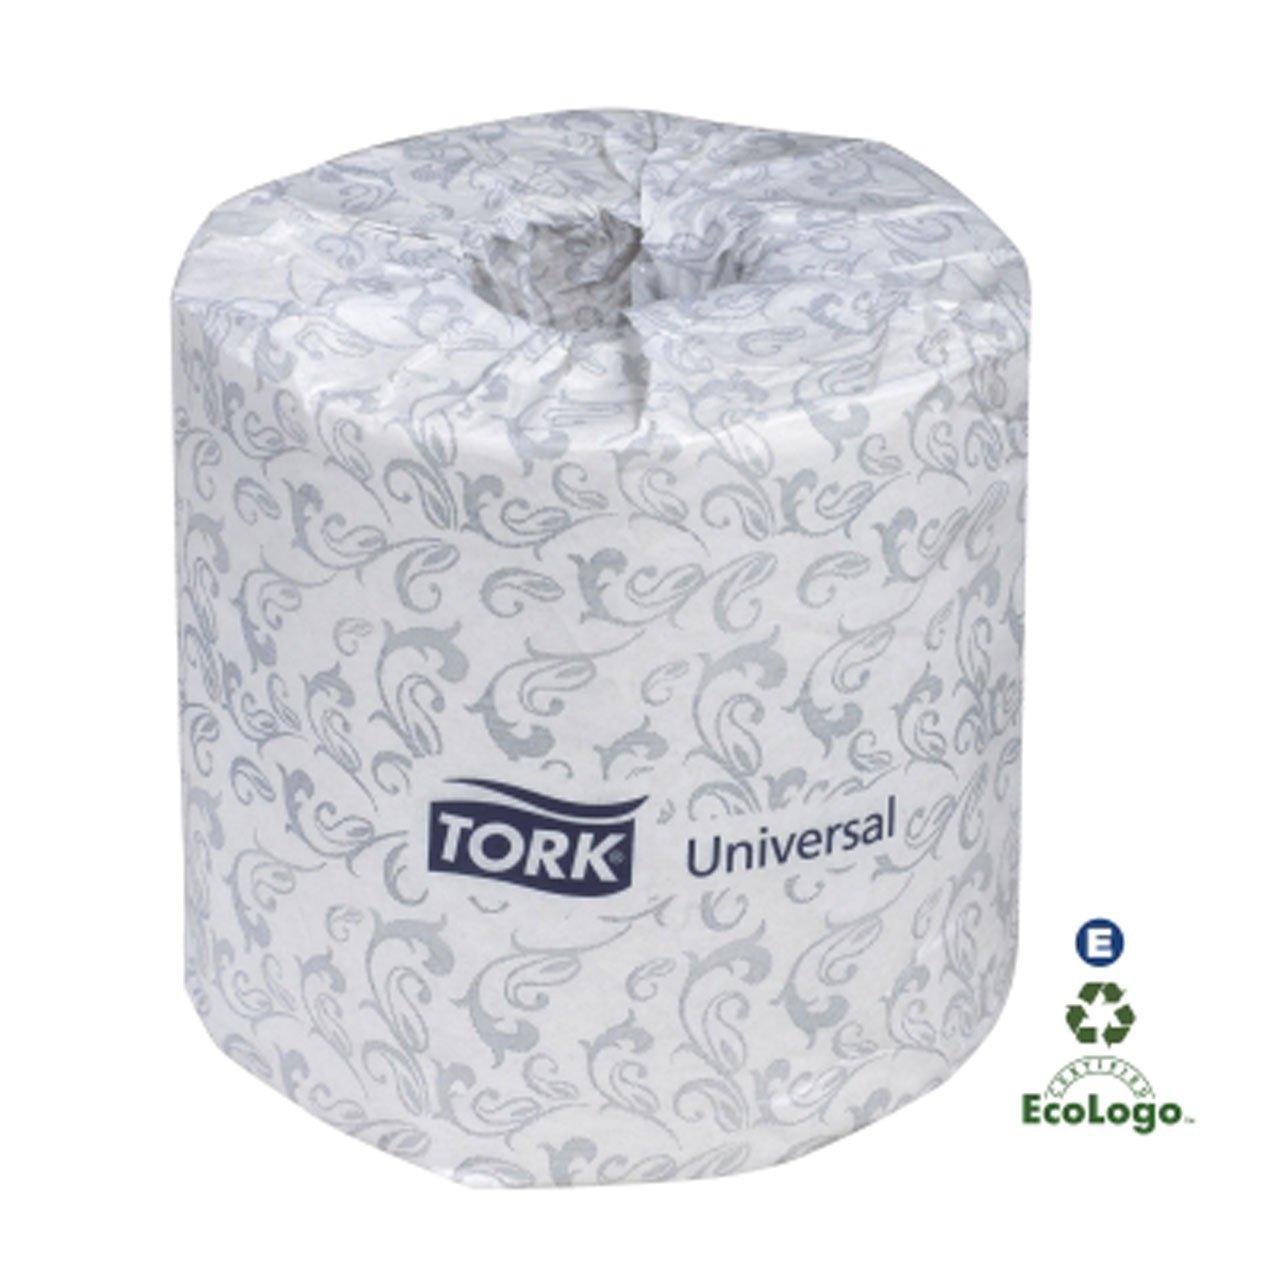 Tork TS1636S Universal Single-Ply Toilet Tissue Roll, White, 96 Rolls